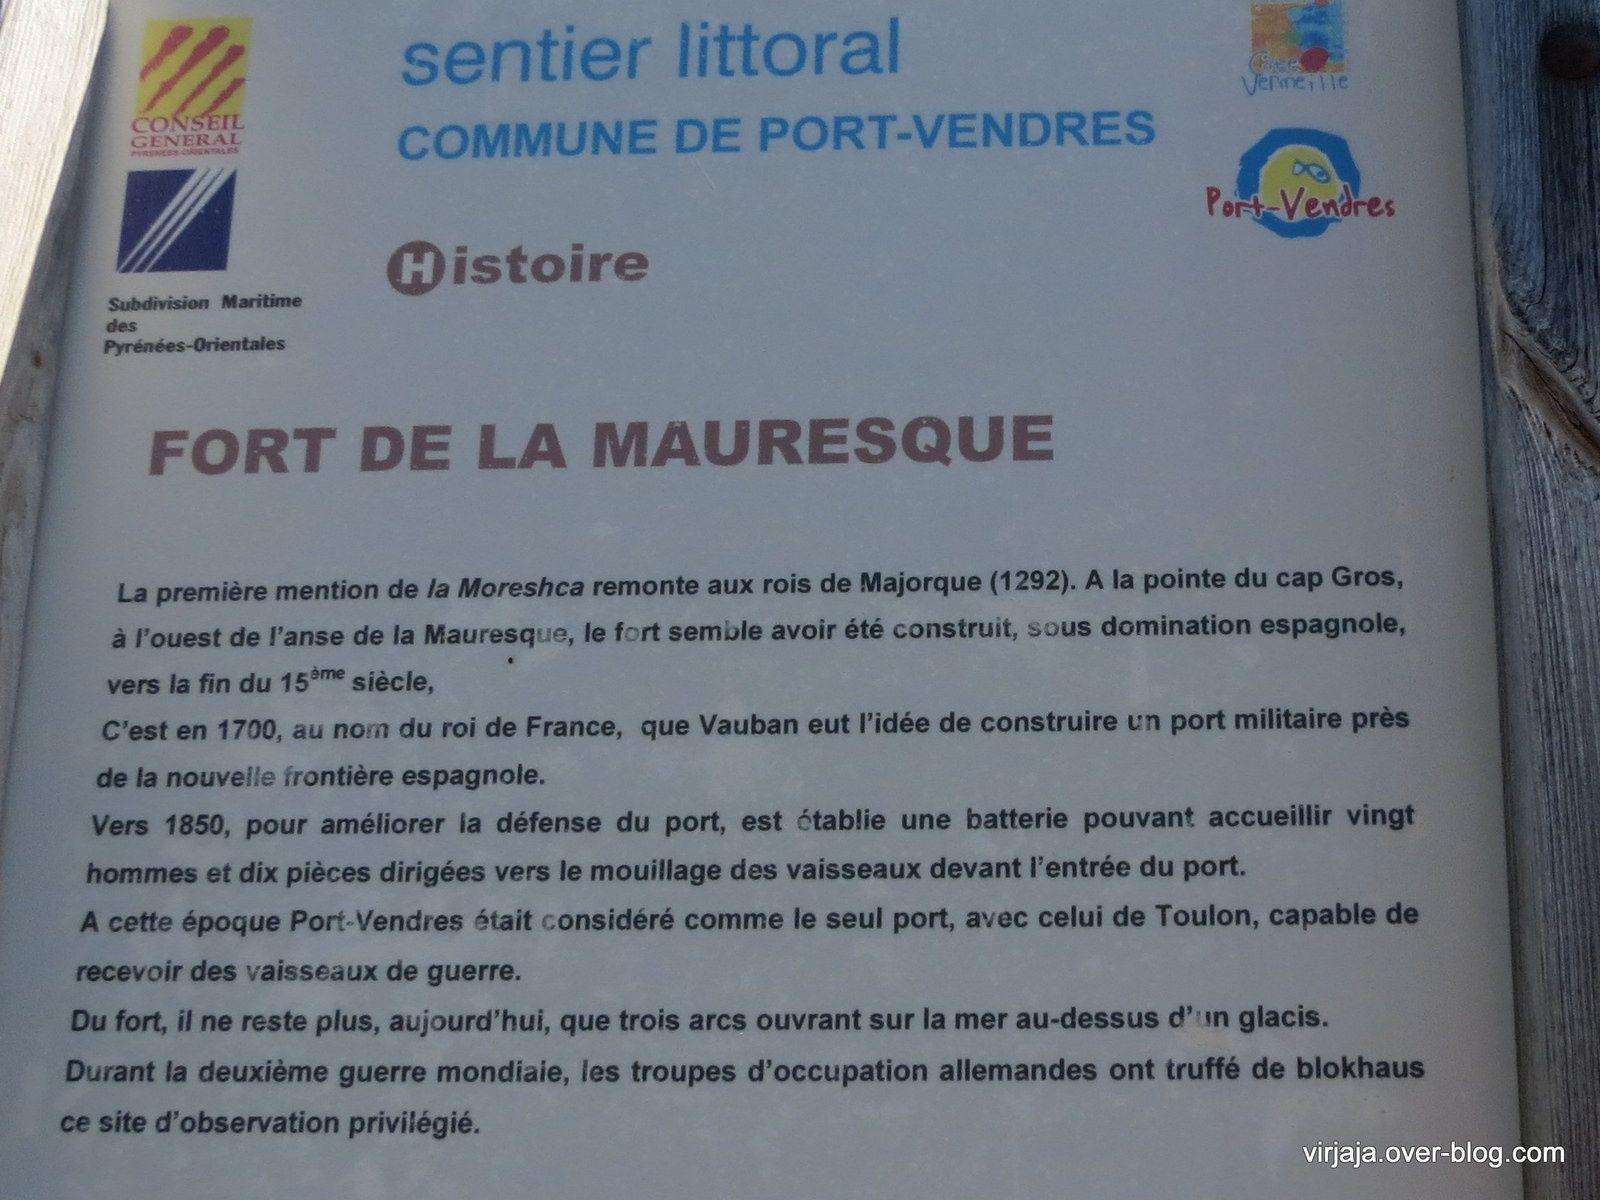 FORT DE LA MAURESQUE